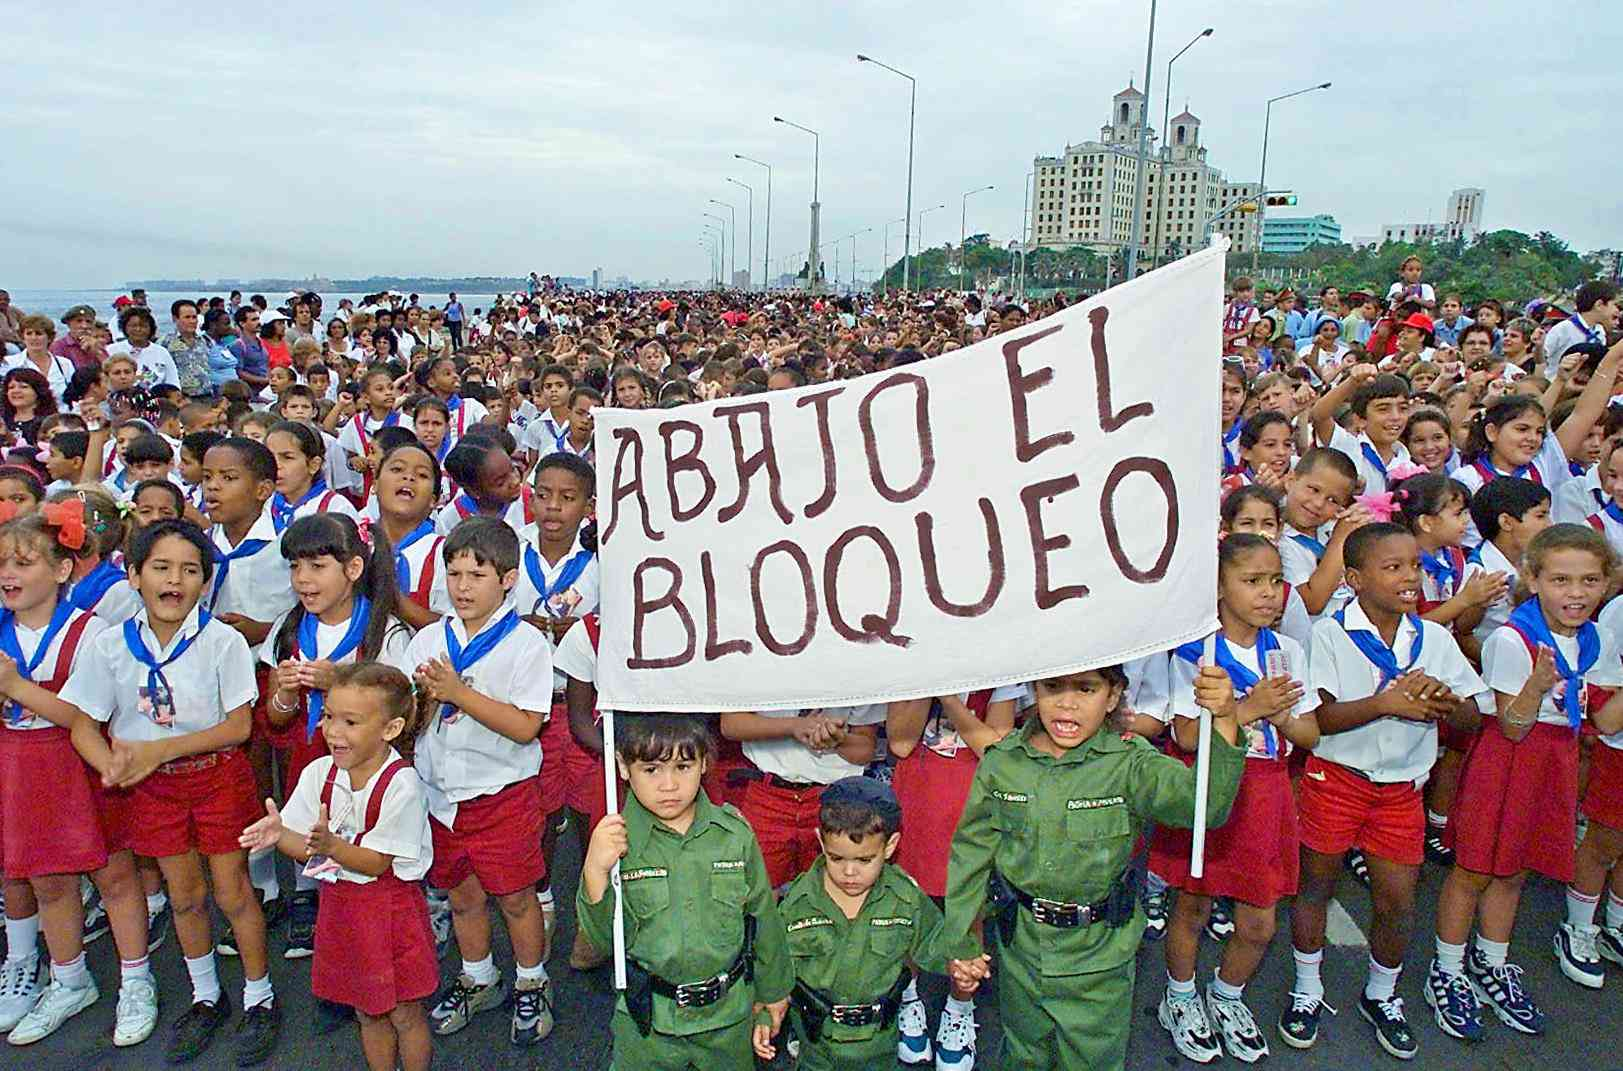 Cuban rallies demanding Elián's return